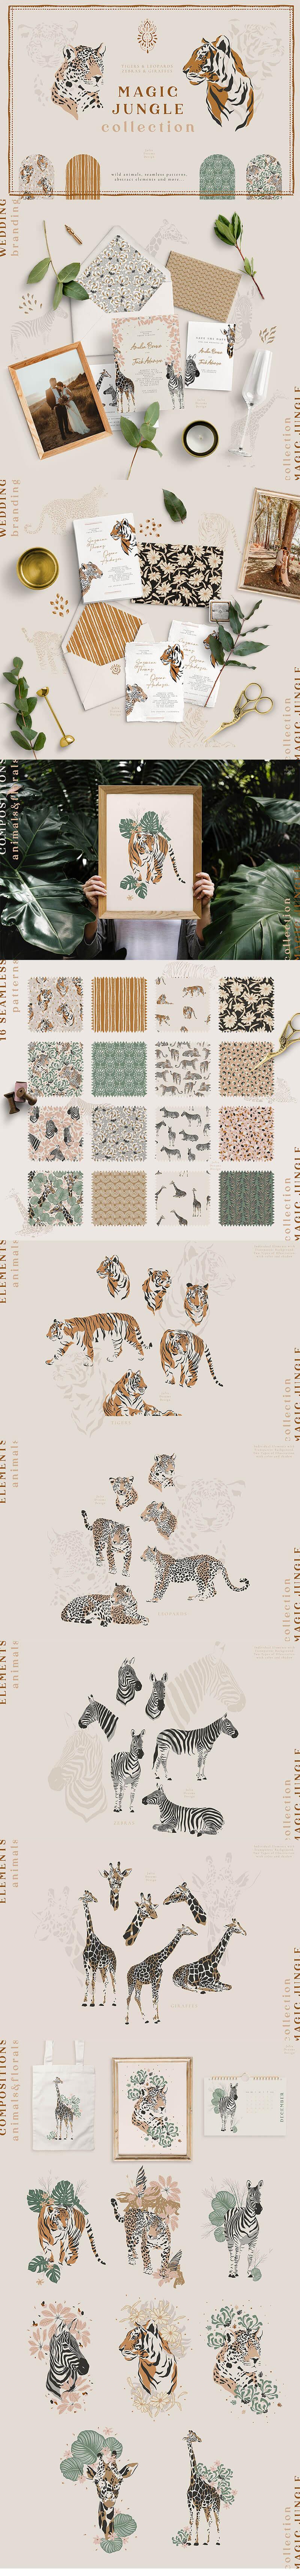 magic-jungle-collection-1